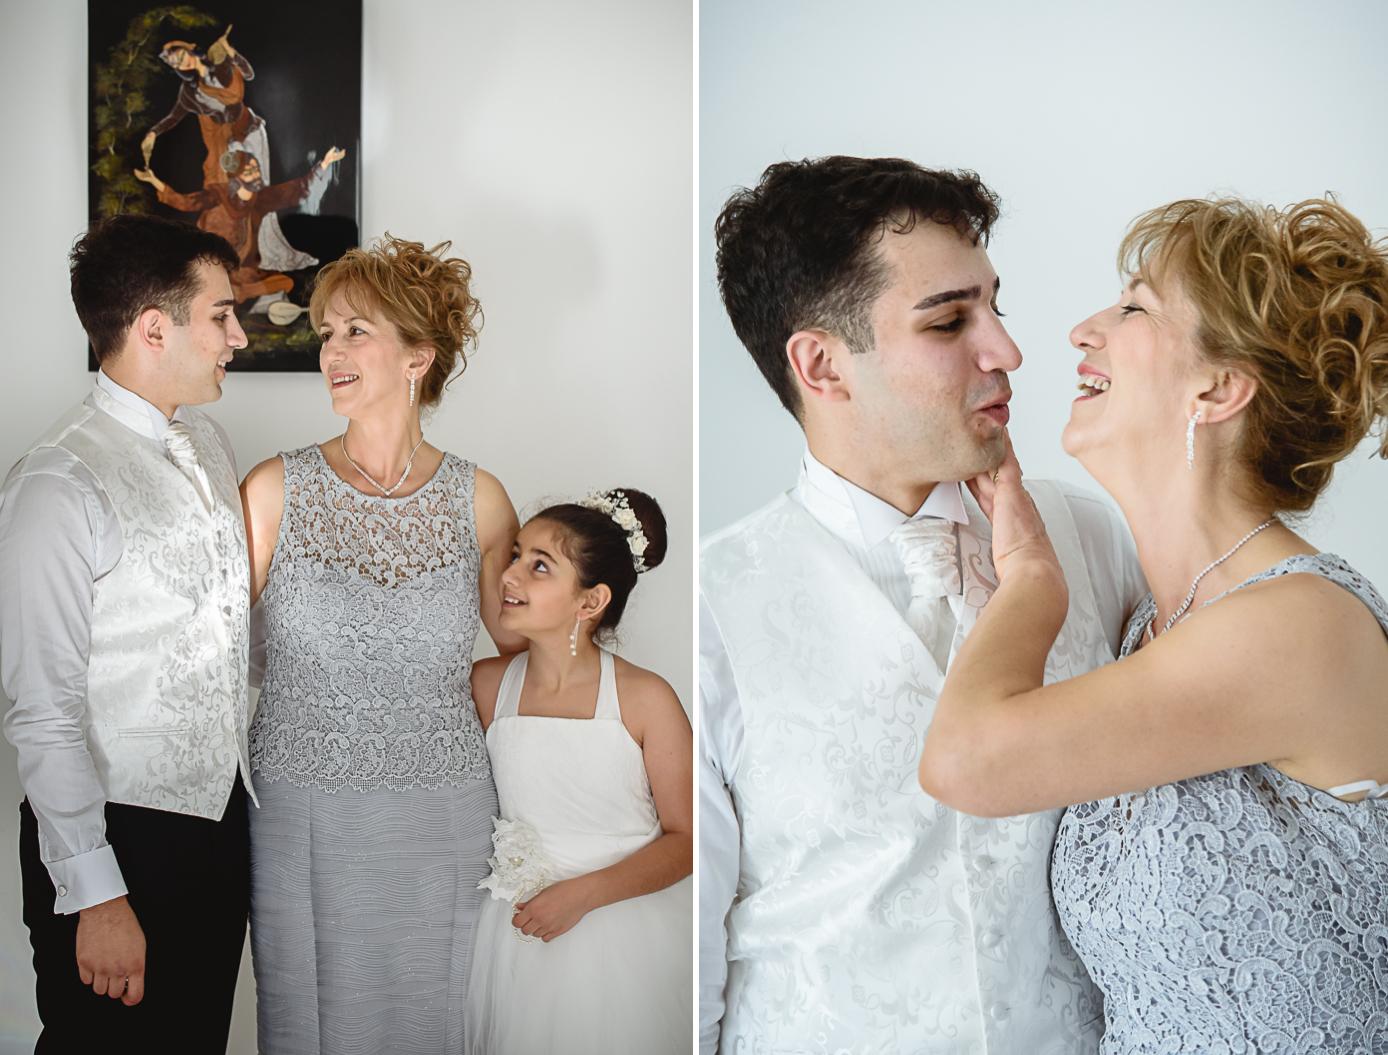 iranian wedding photographer 9 - Drapers Hall London Wedding Photographer